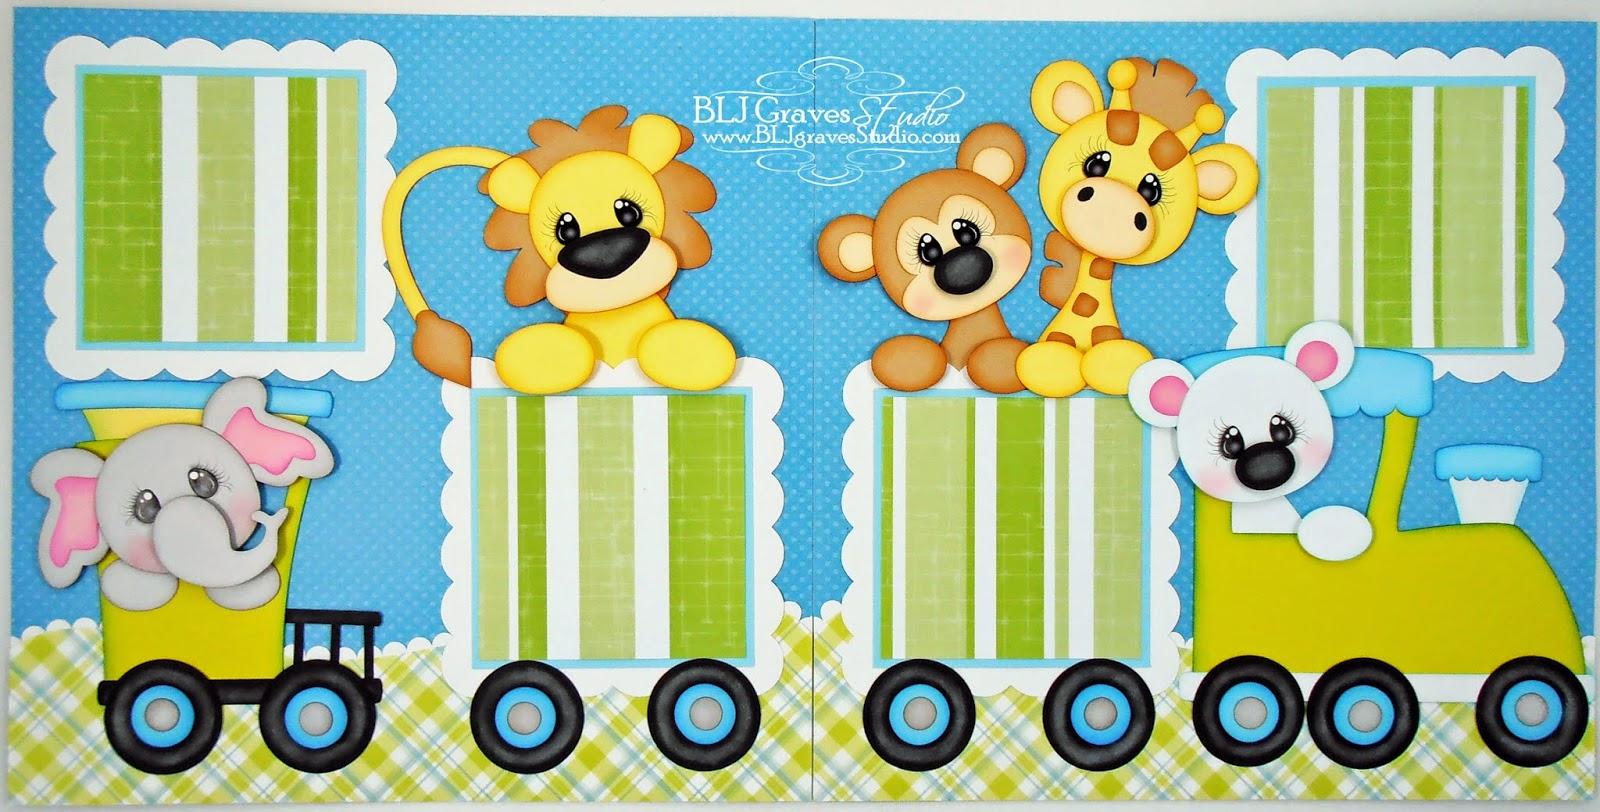 Scrapbook ideas zoo - Blj Graves Studio Baby Boy Train Zoo Scrapbook Pages 1600x812